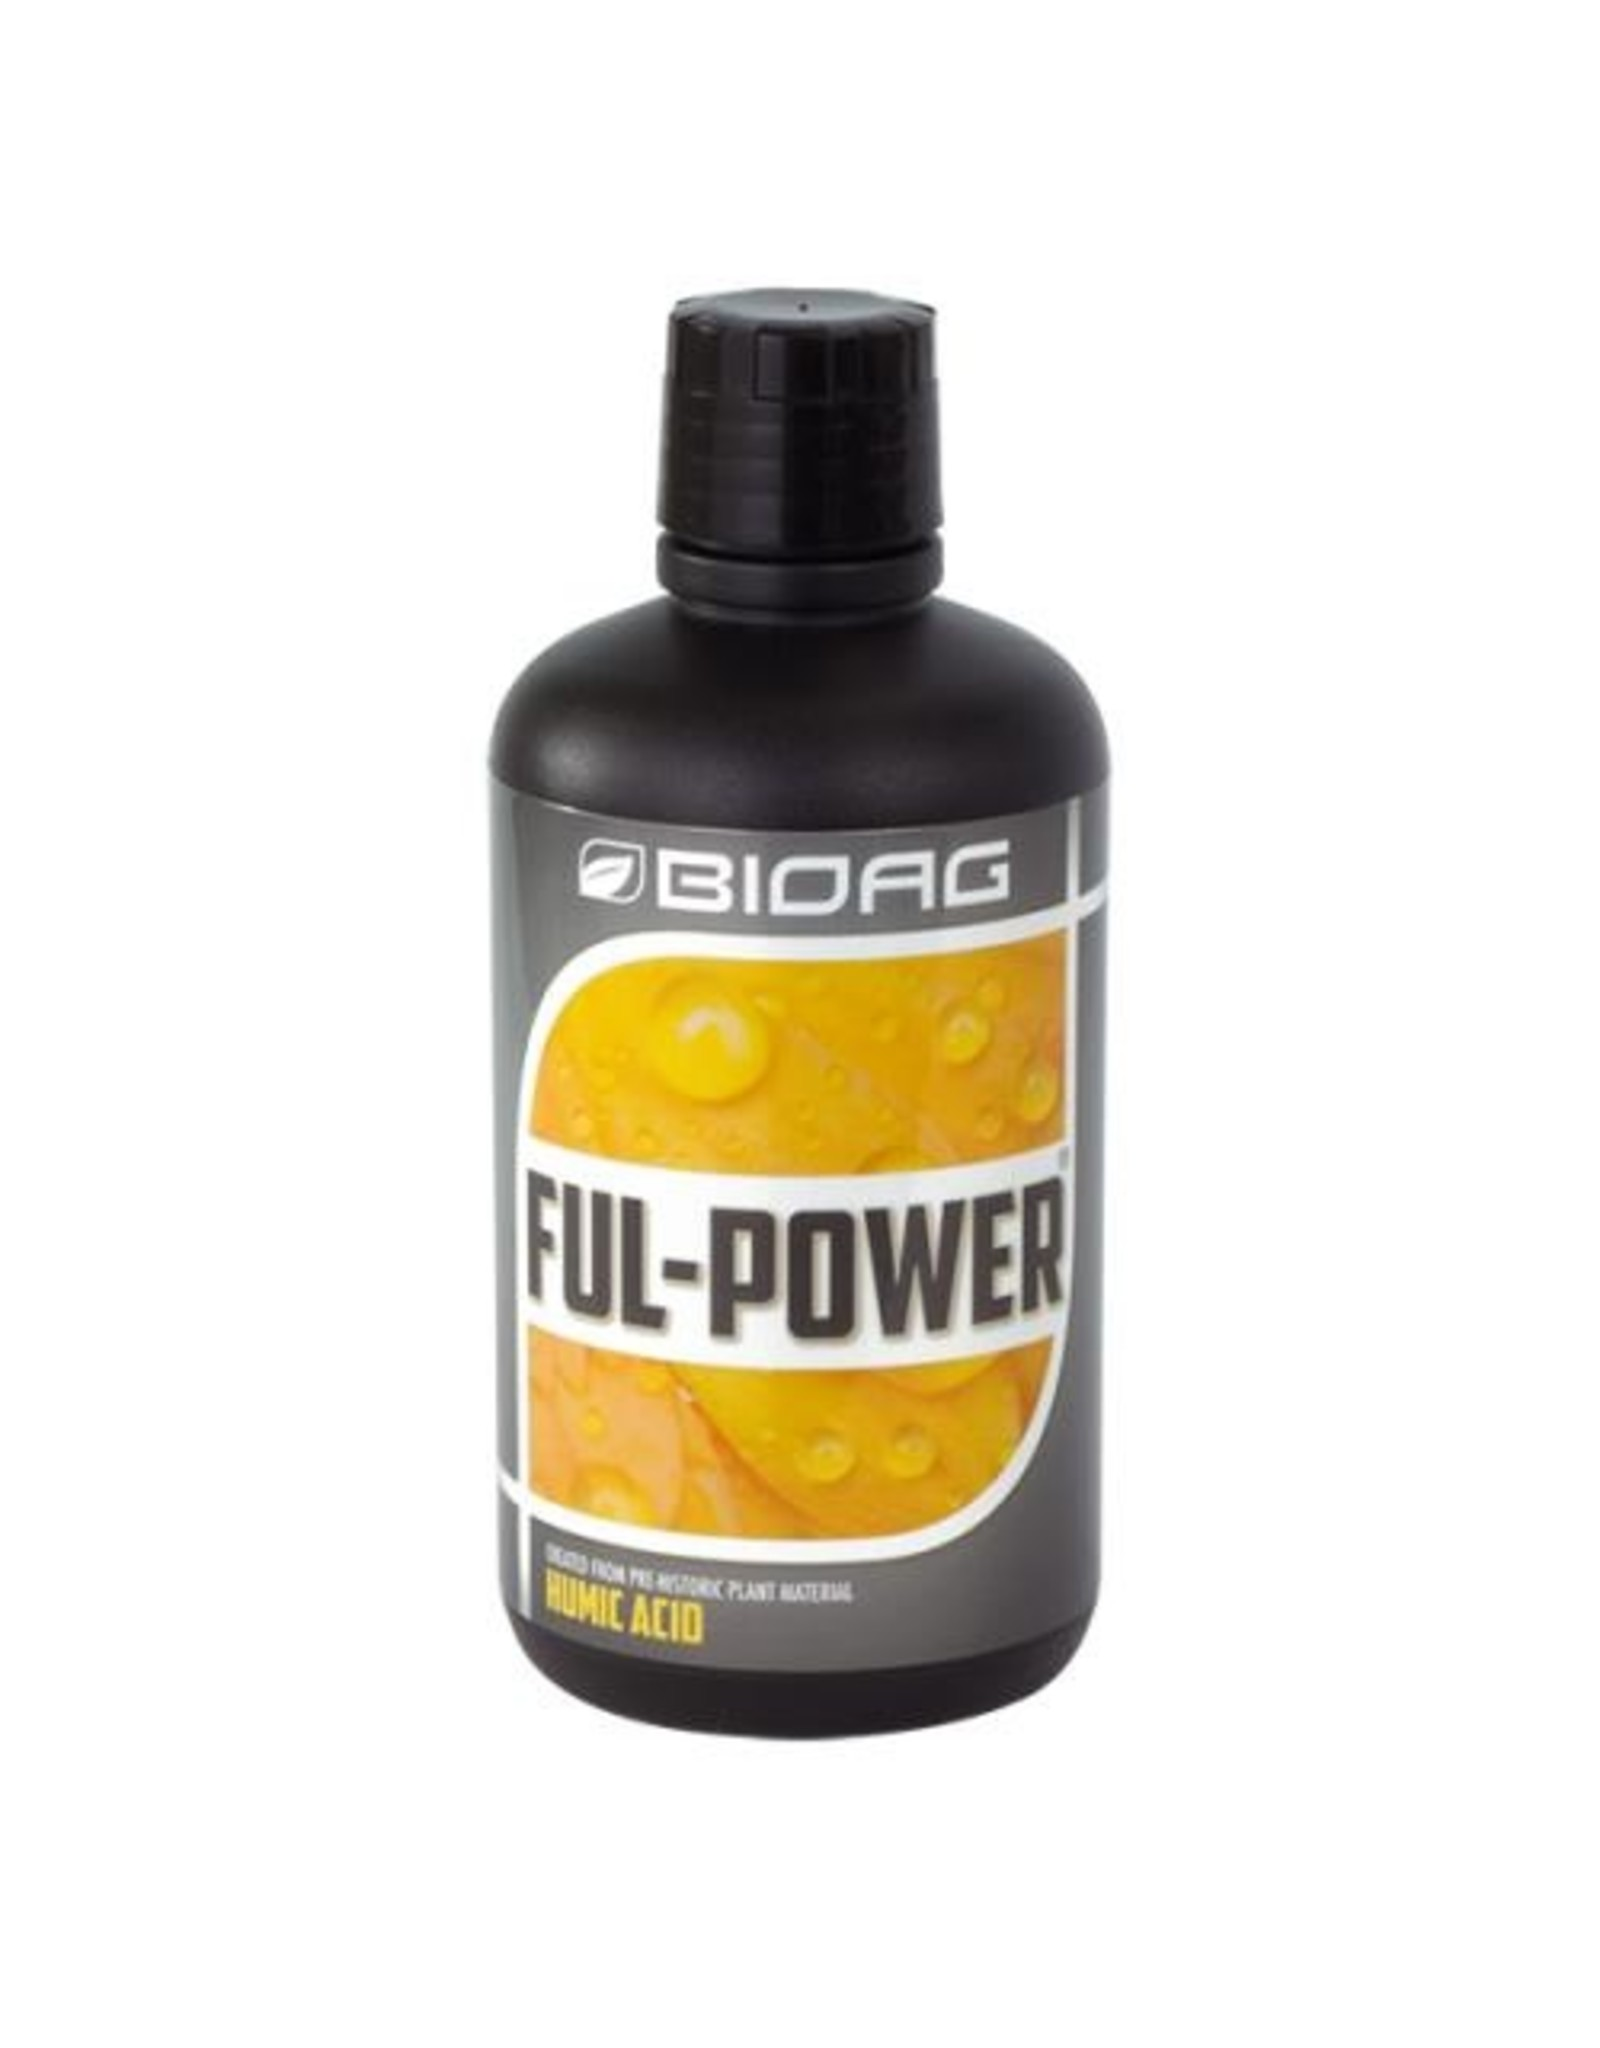 BioAg BioAg Ful-Power Quart